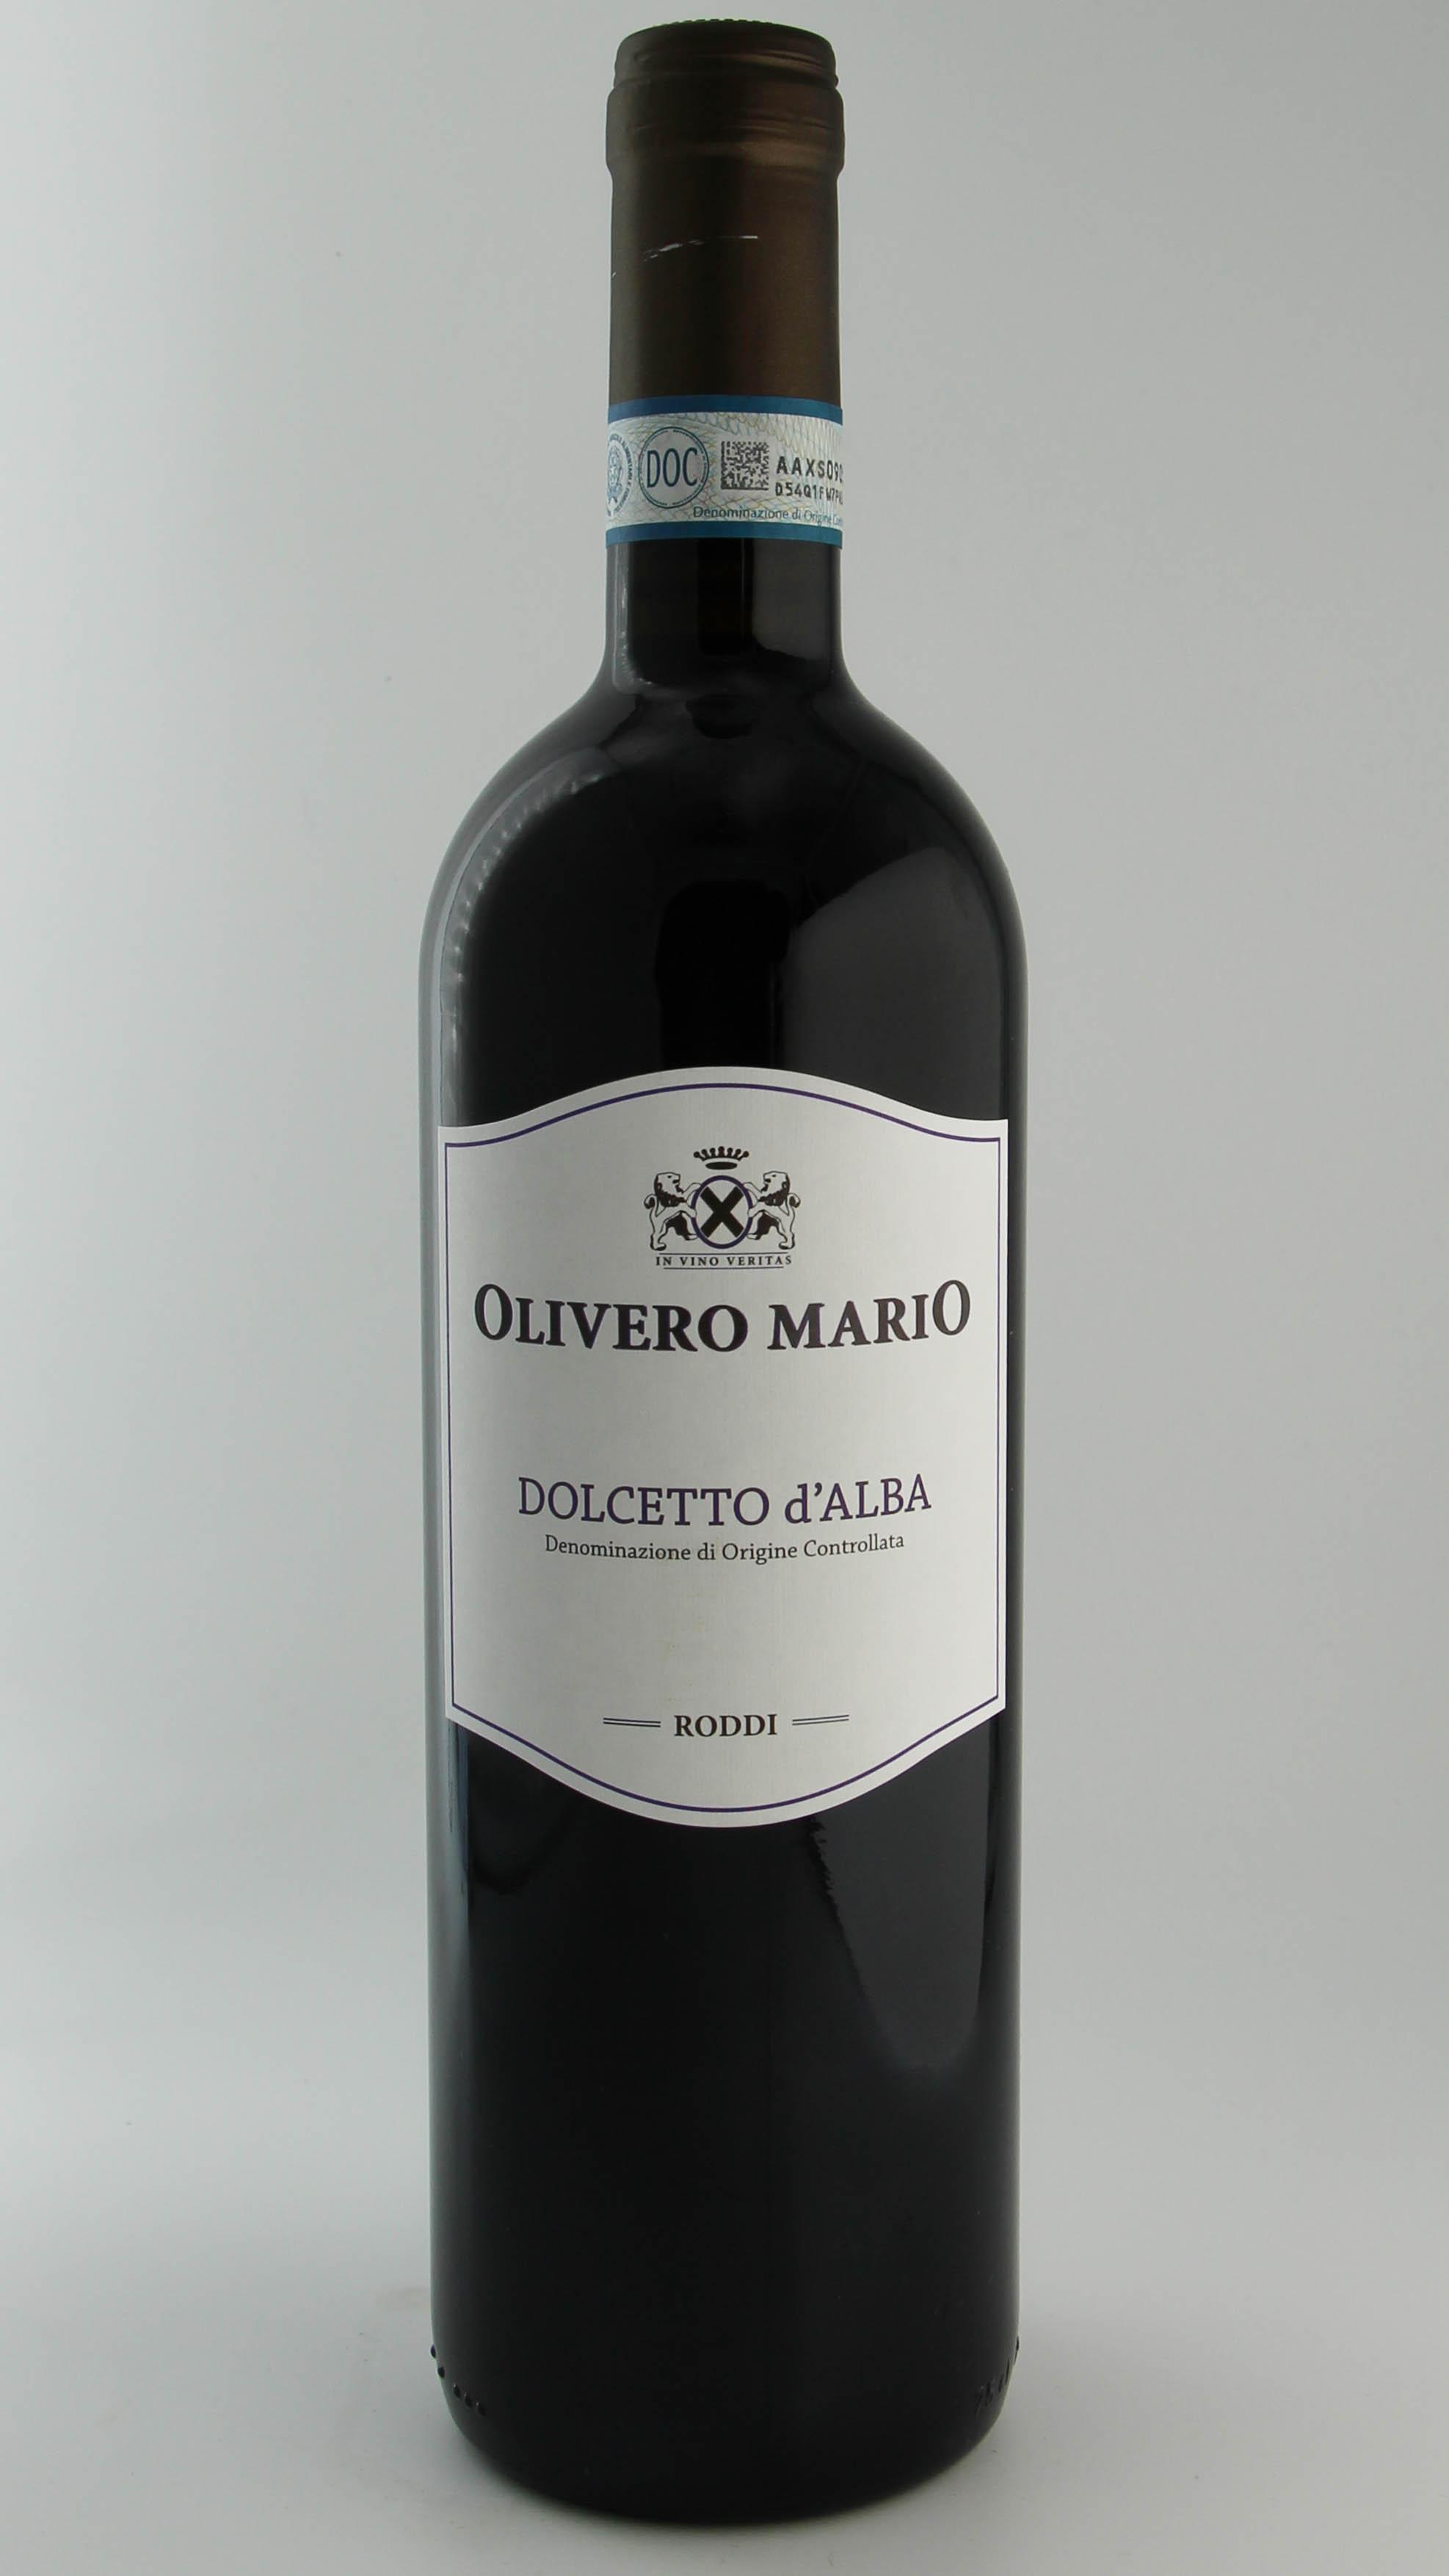 Produktbild Dolcetto d'Alba